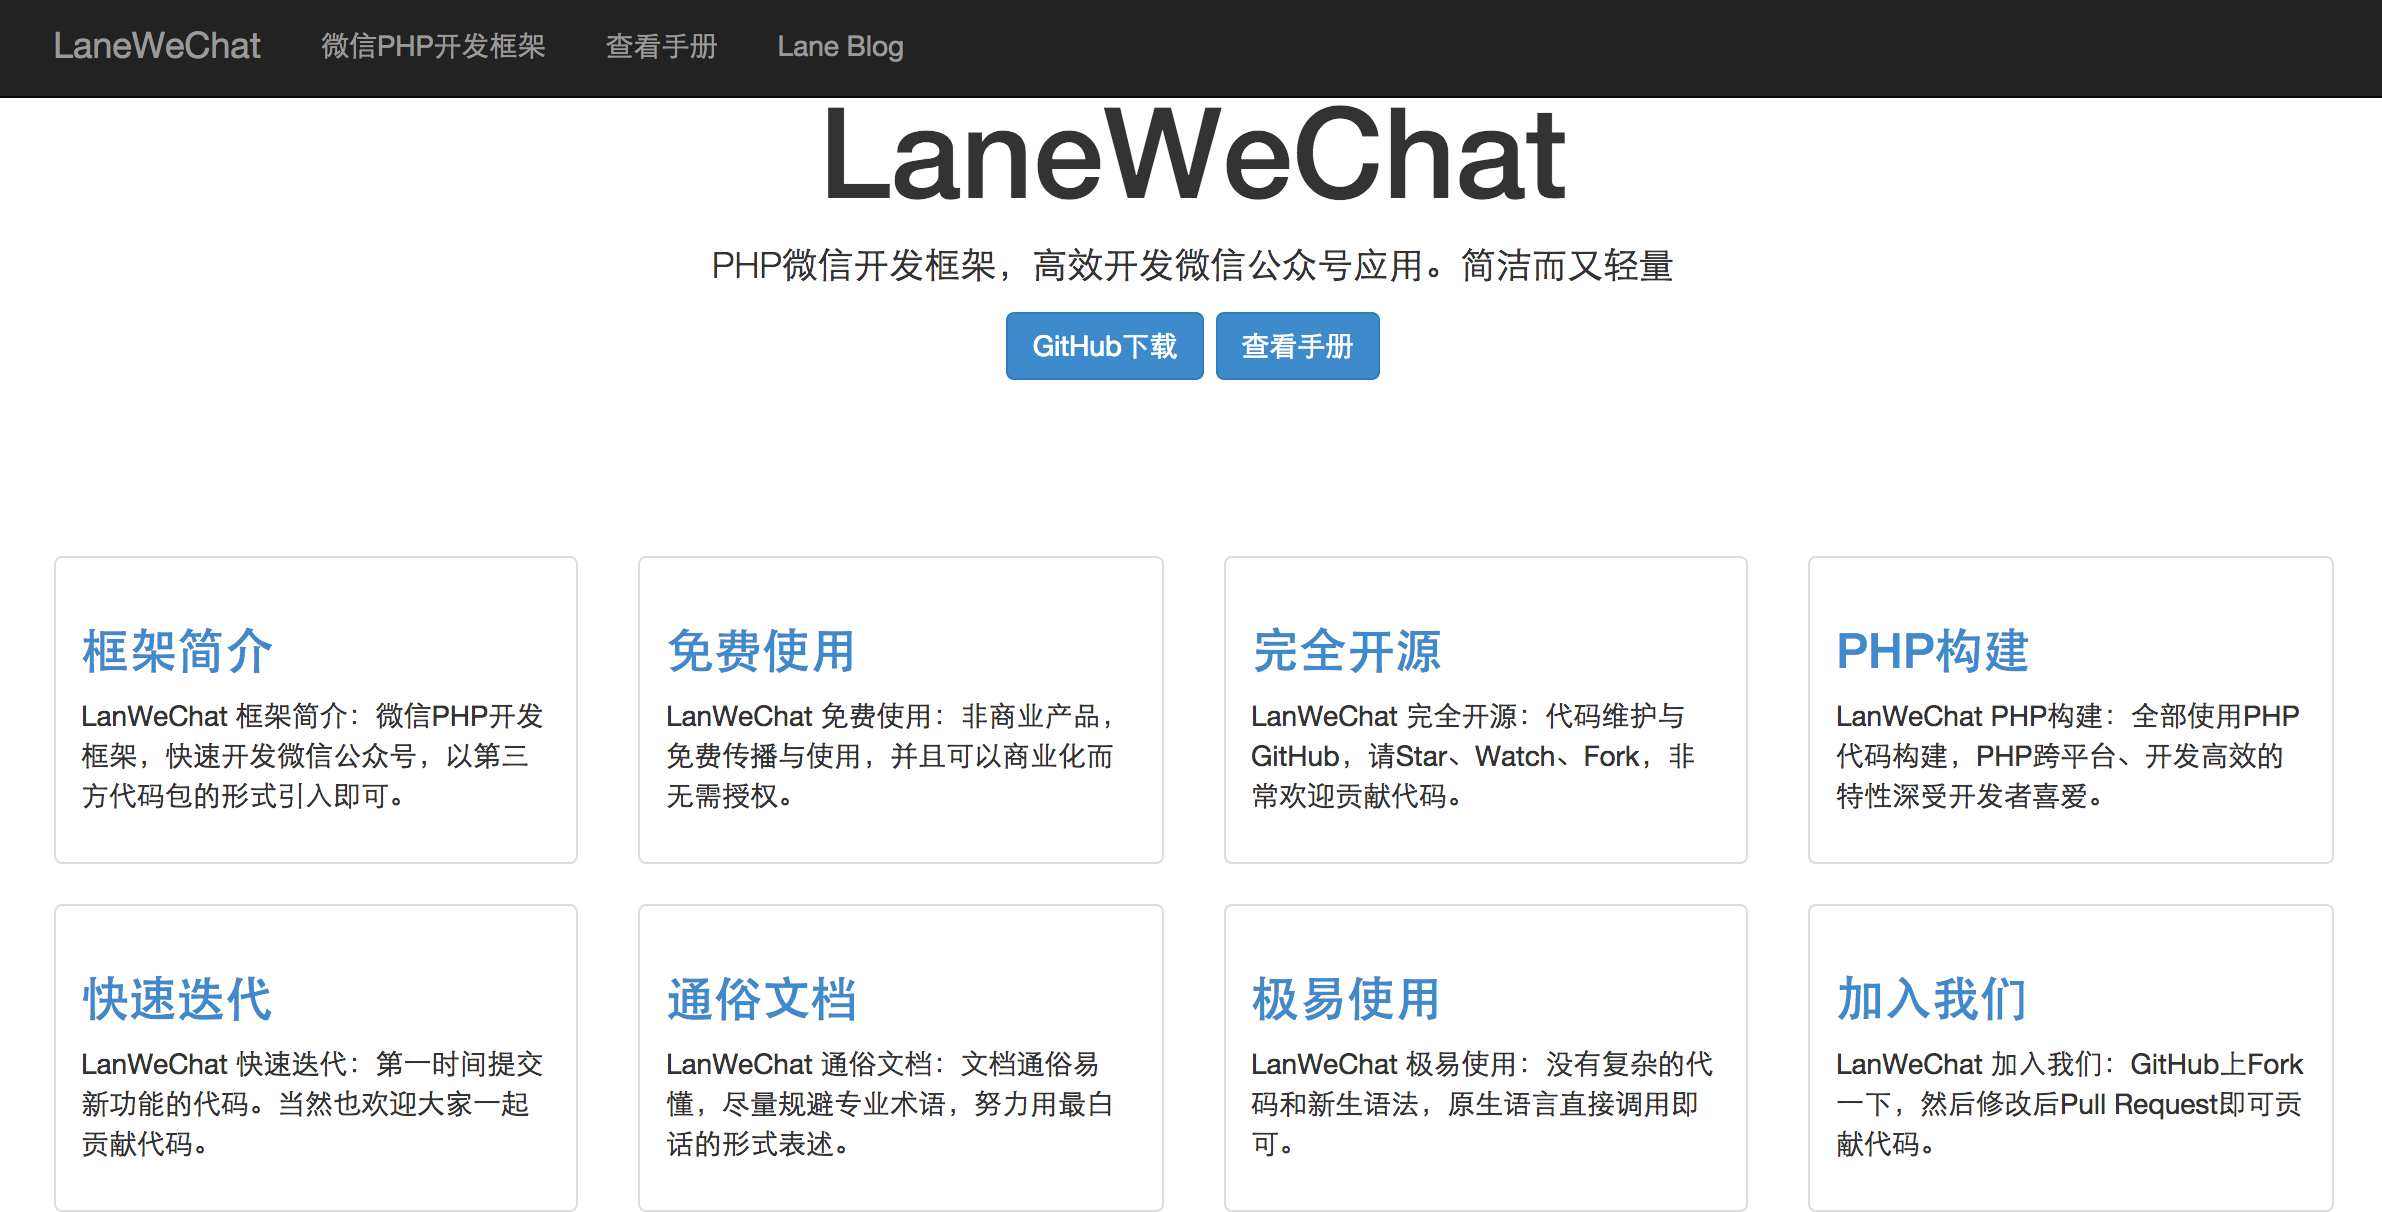 LaneWeChat